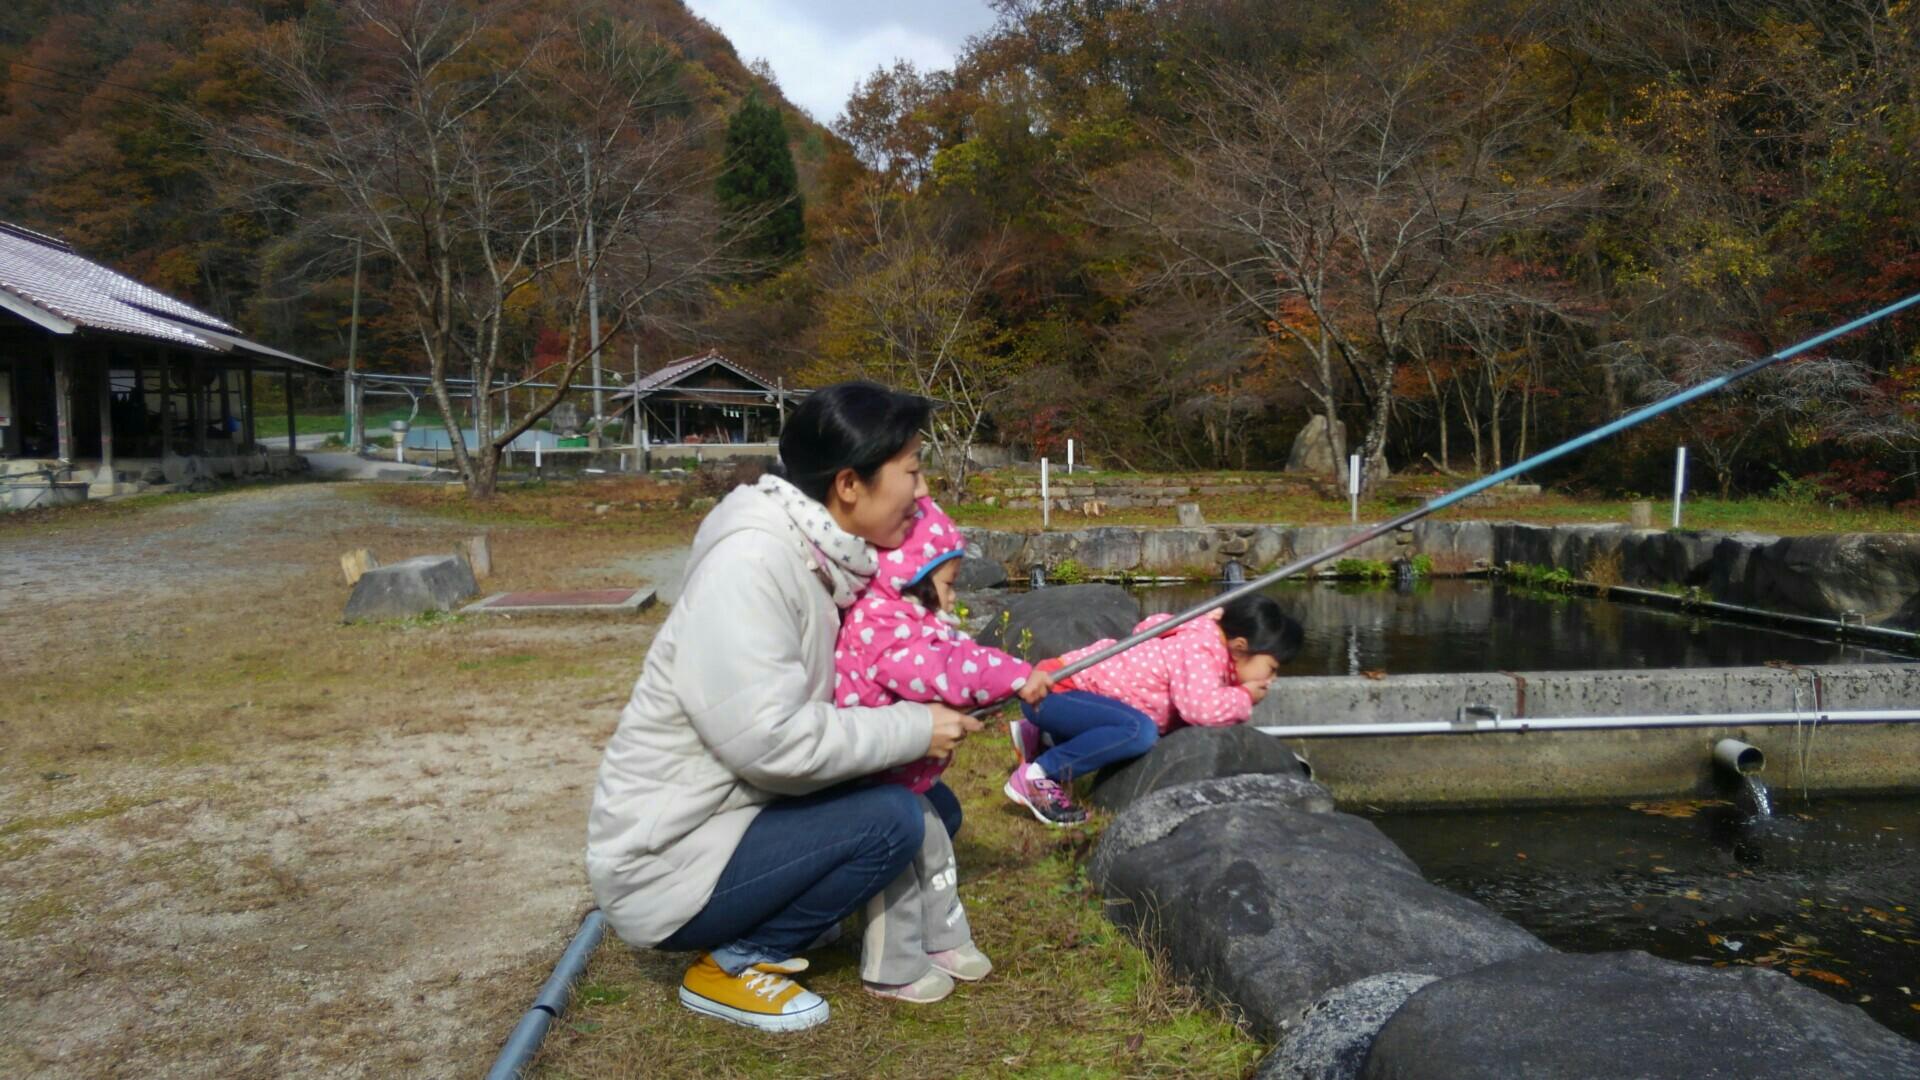 f:id:shihomaru:20171111195536j:image